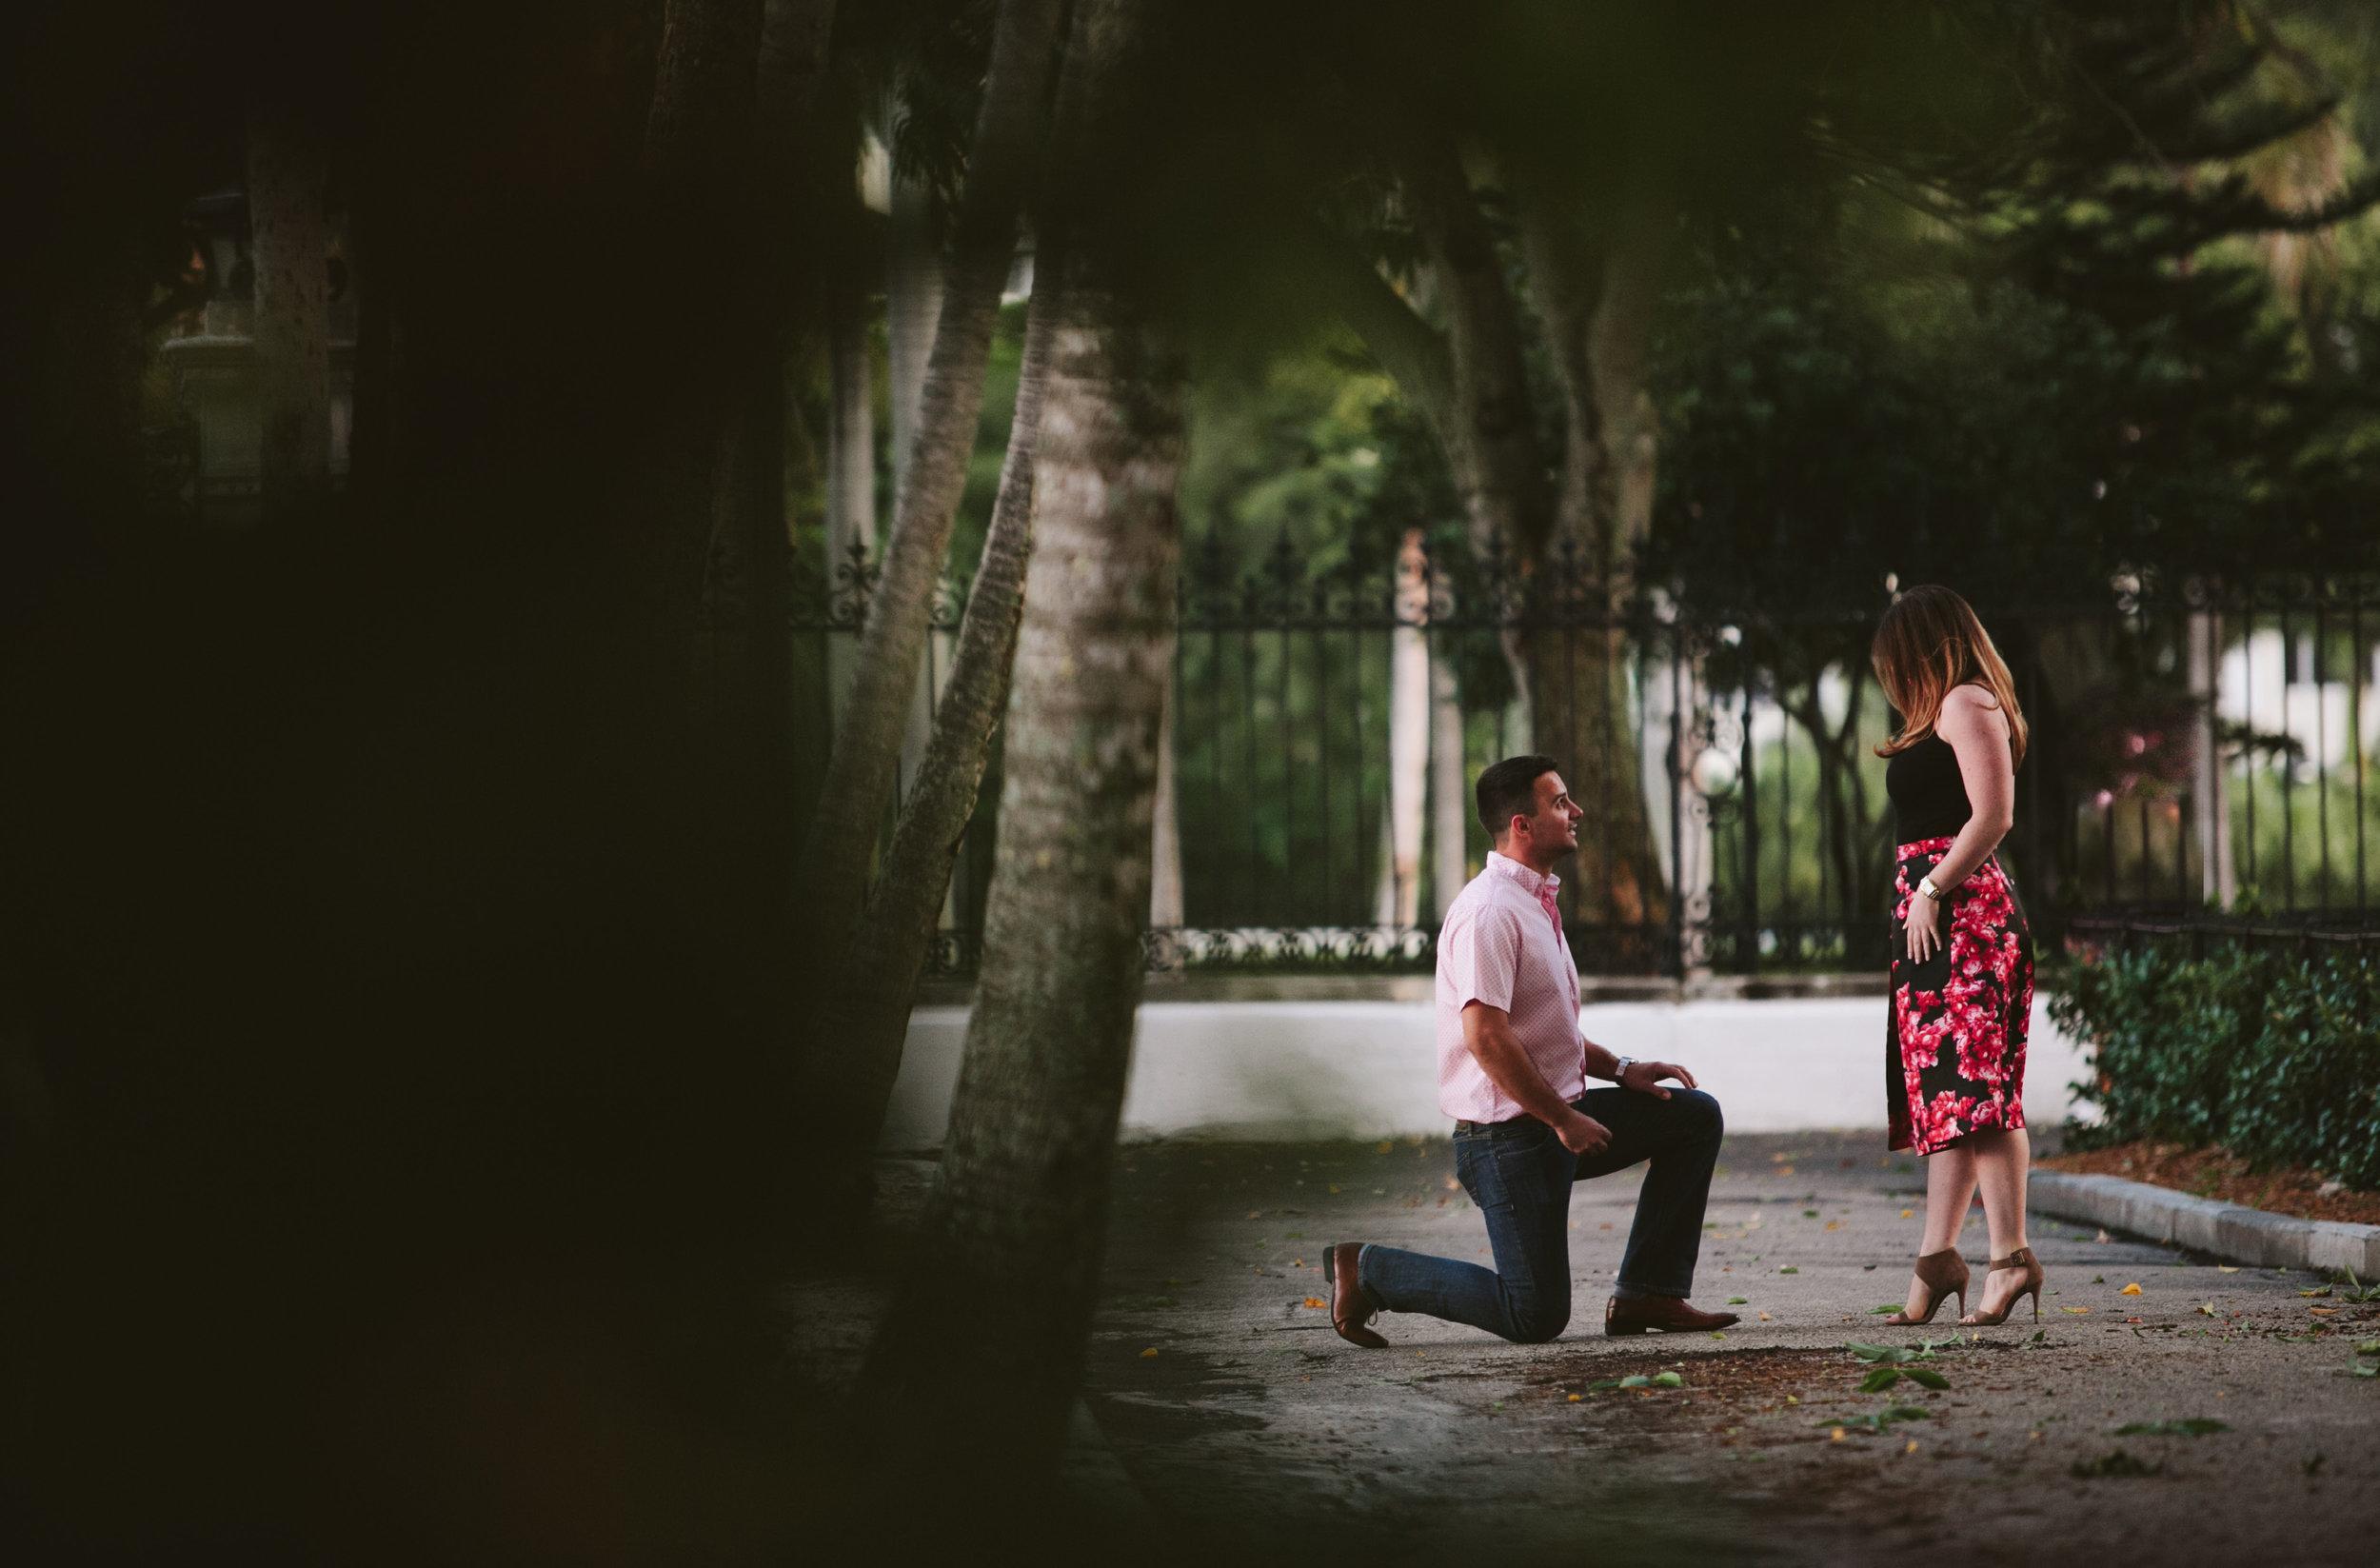 Ida + Danny Surprise Proposal Engagement Shoot at Flagler Museum Palm Beach1.jpg